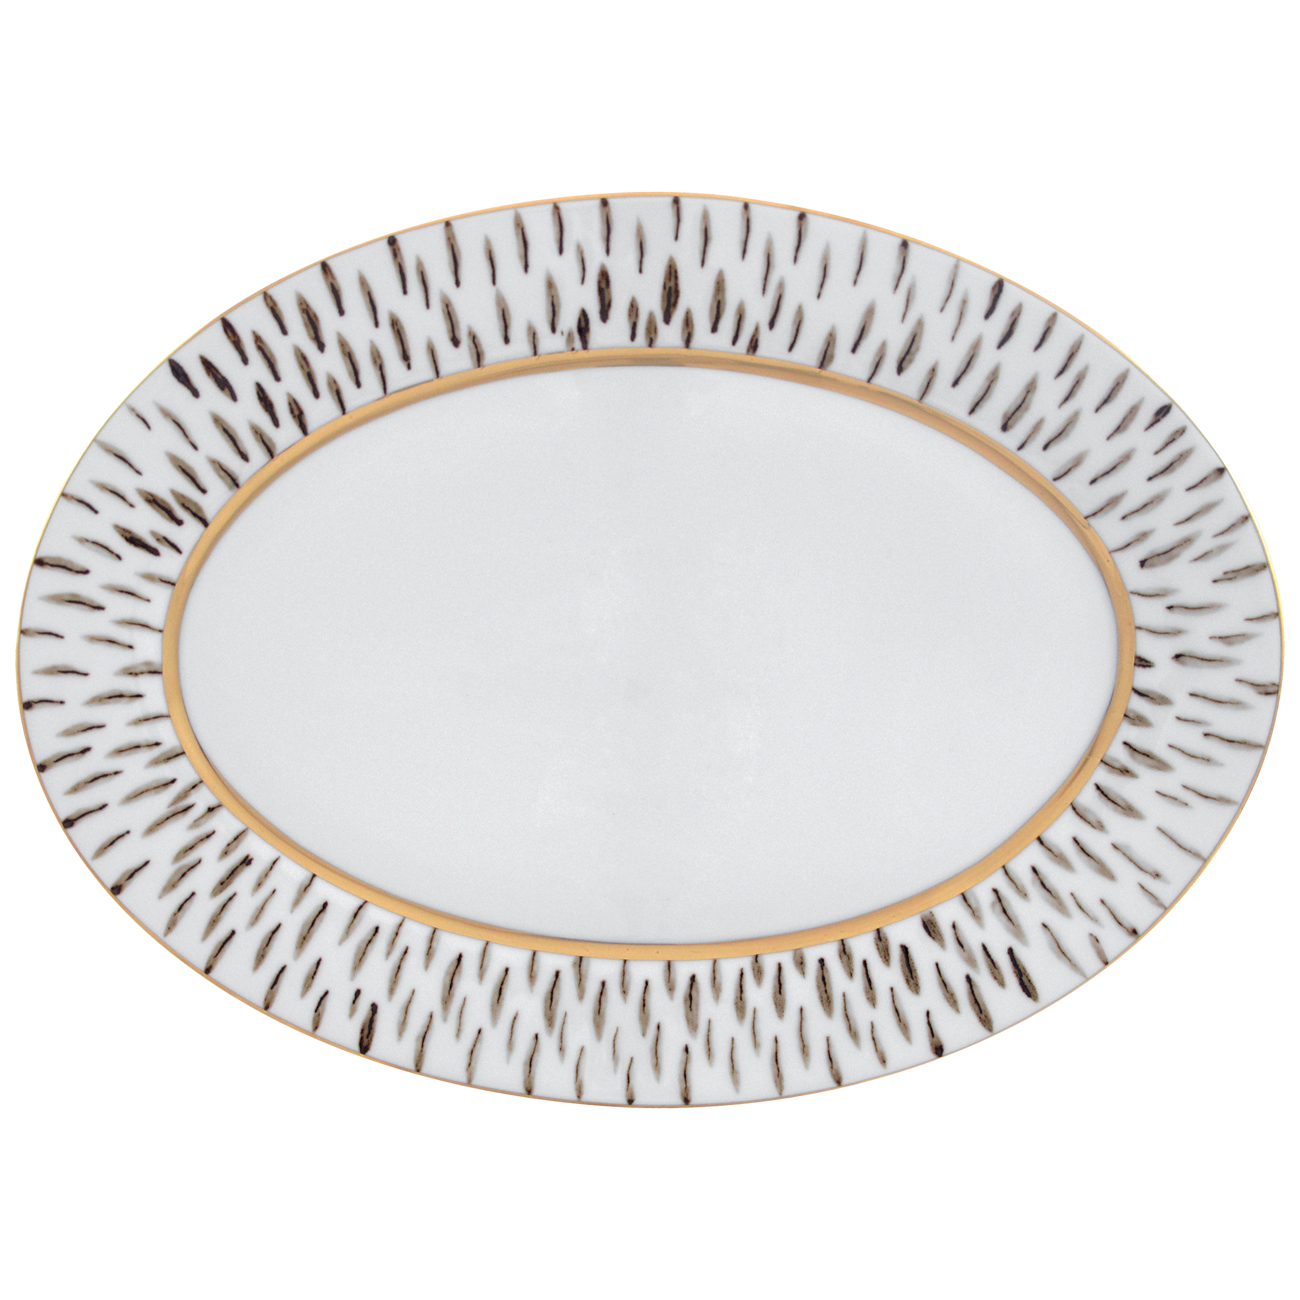 Oval Platter 39cm Myth 1